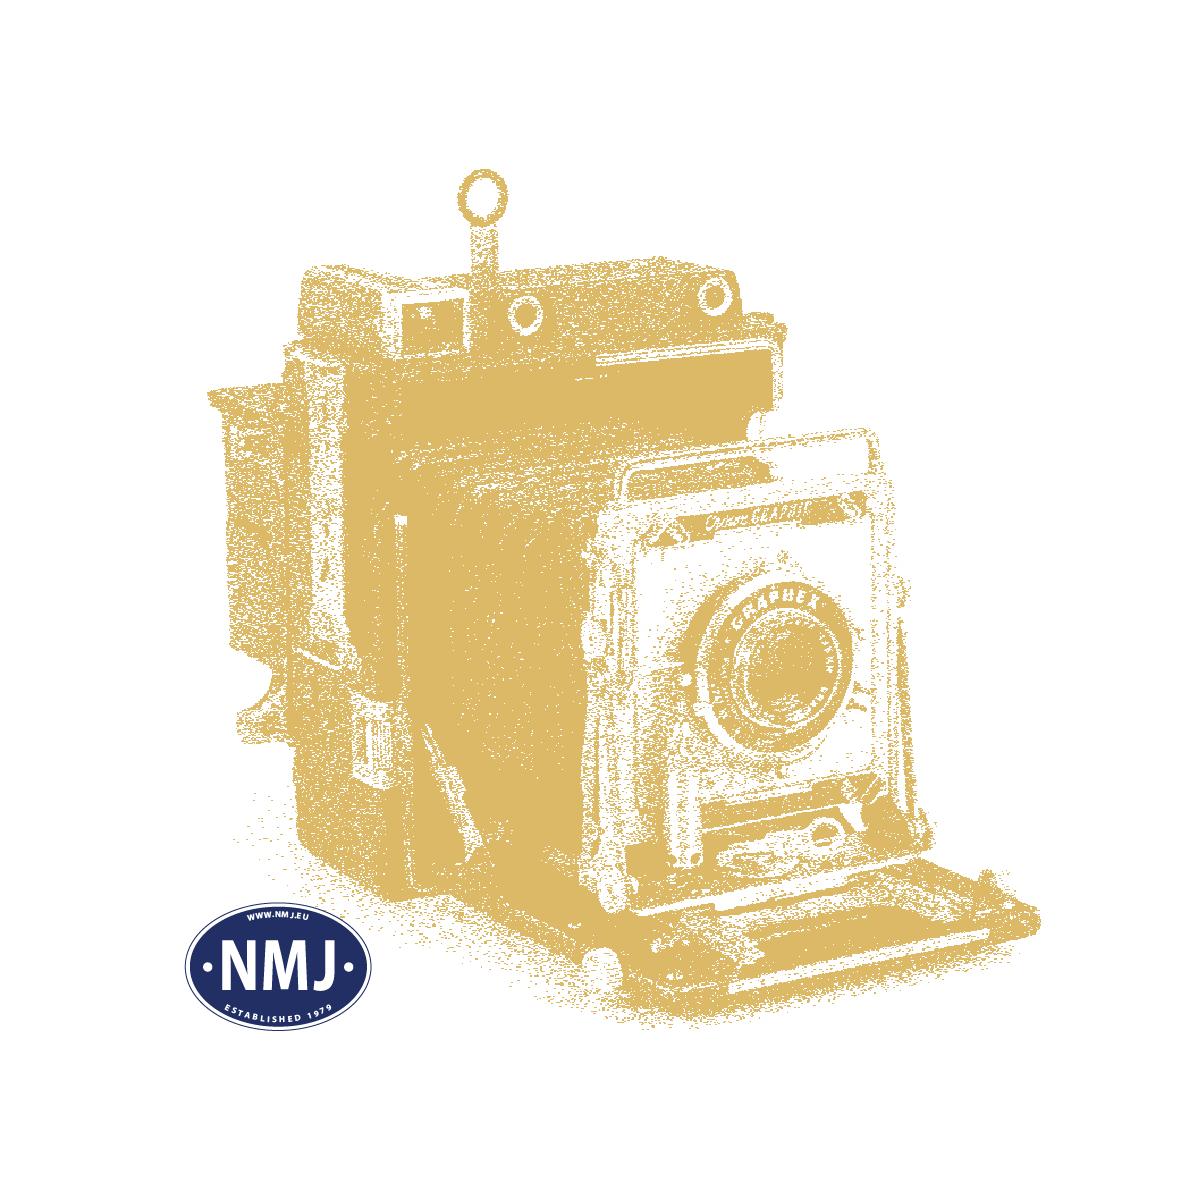 NMJT130.101 - NMJ Topline NSB B3-2 25503 Type 3, Gammeldesign